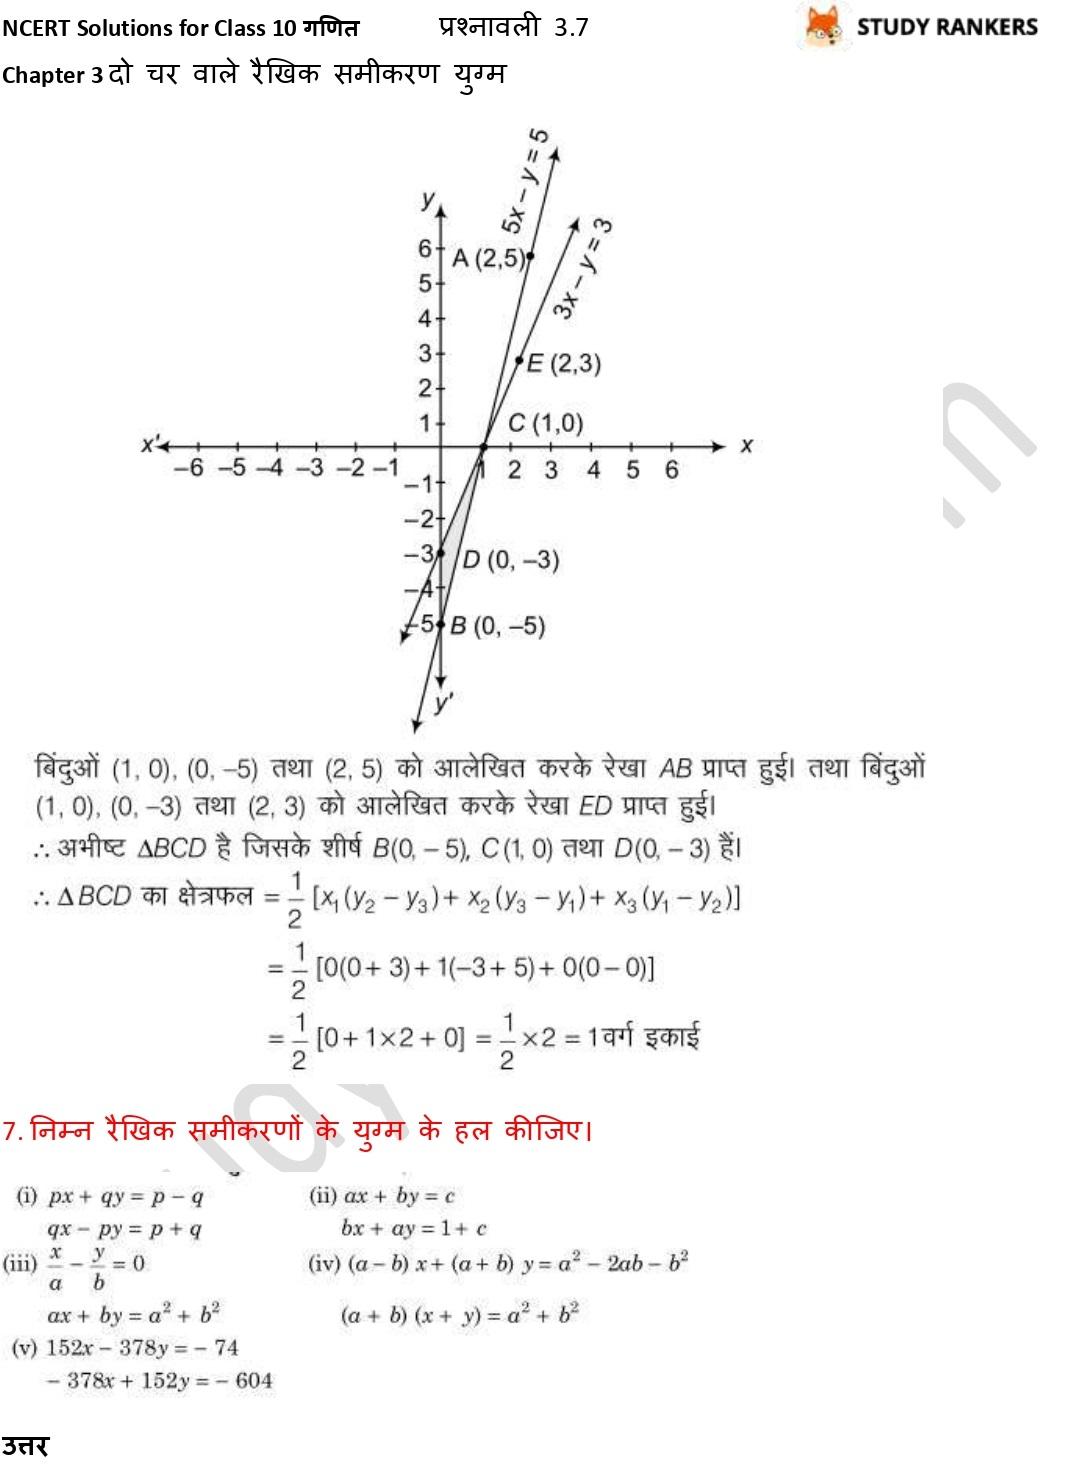 NCERT Solutions for Class 10 Maths Chapter 3 दो चर वाले रैखिक समीकरण युग्म प्रश्नावली 3.7 Part 7